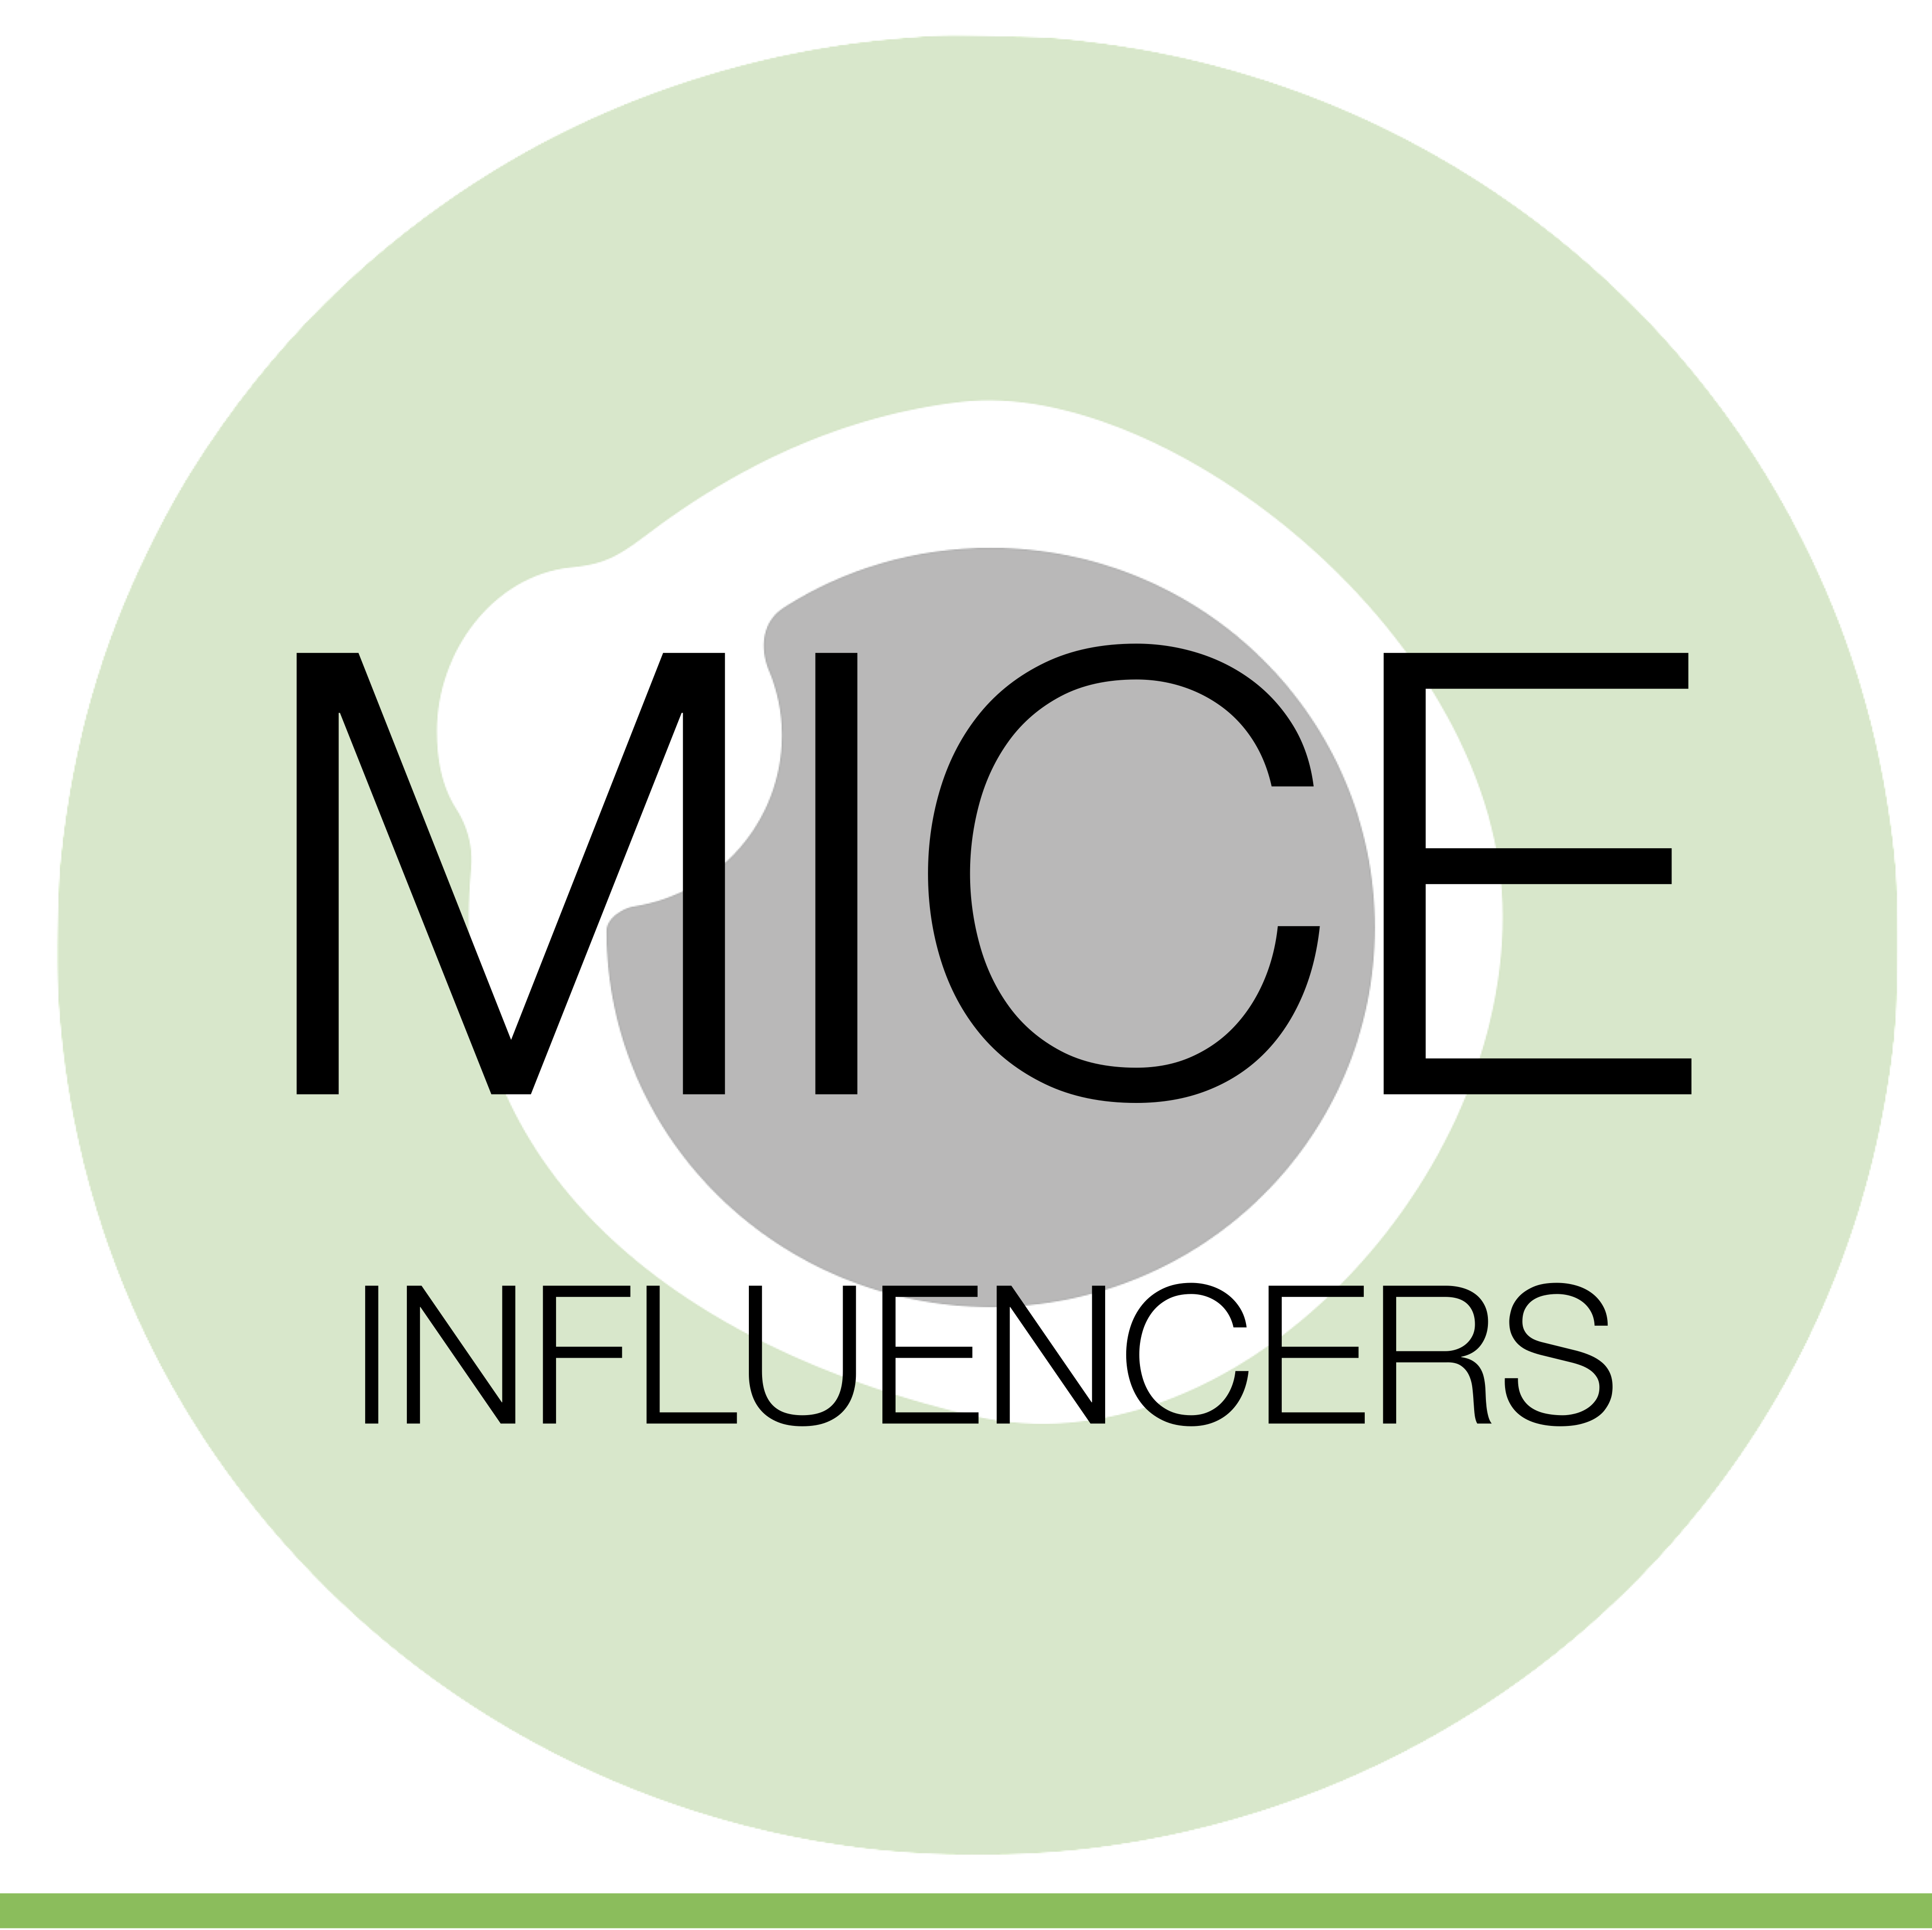 MICE Ireland.png